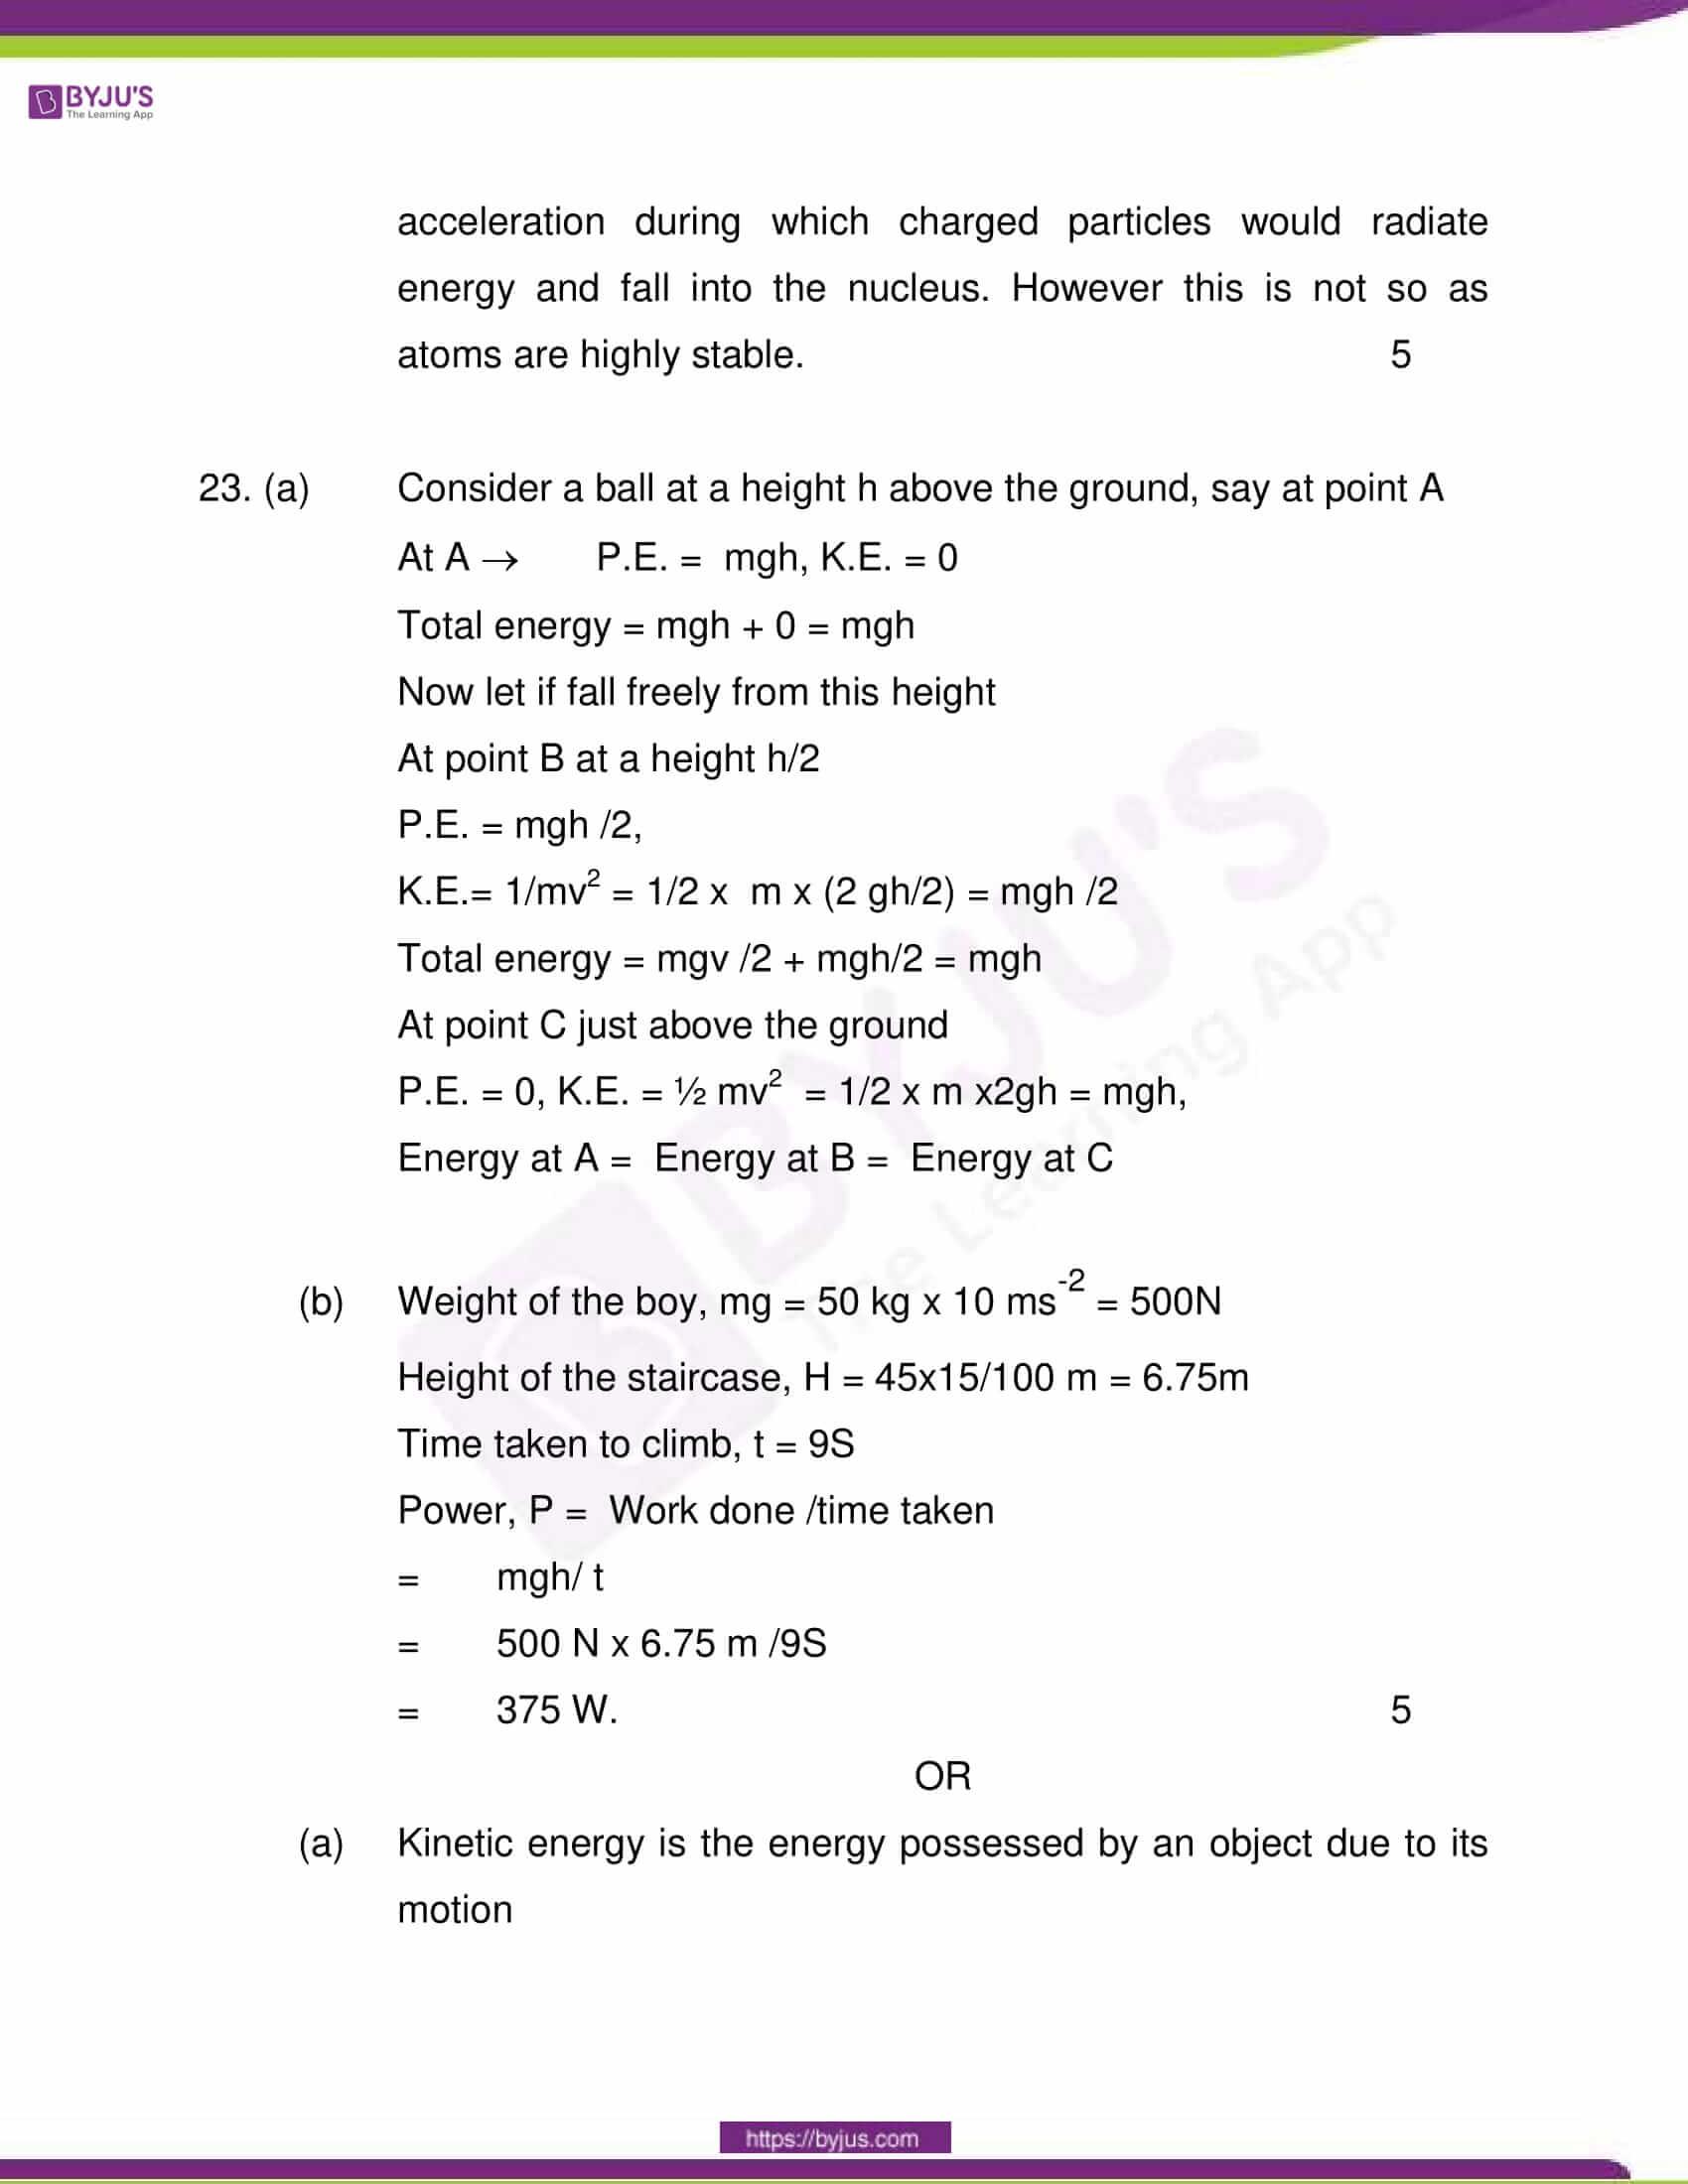 cbse sample paper class 9 science set 4 solution